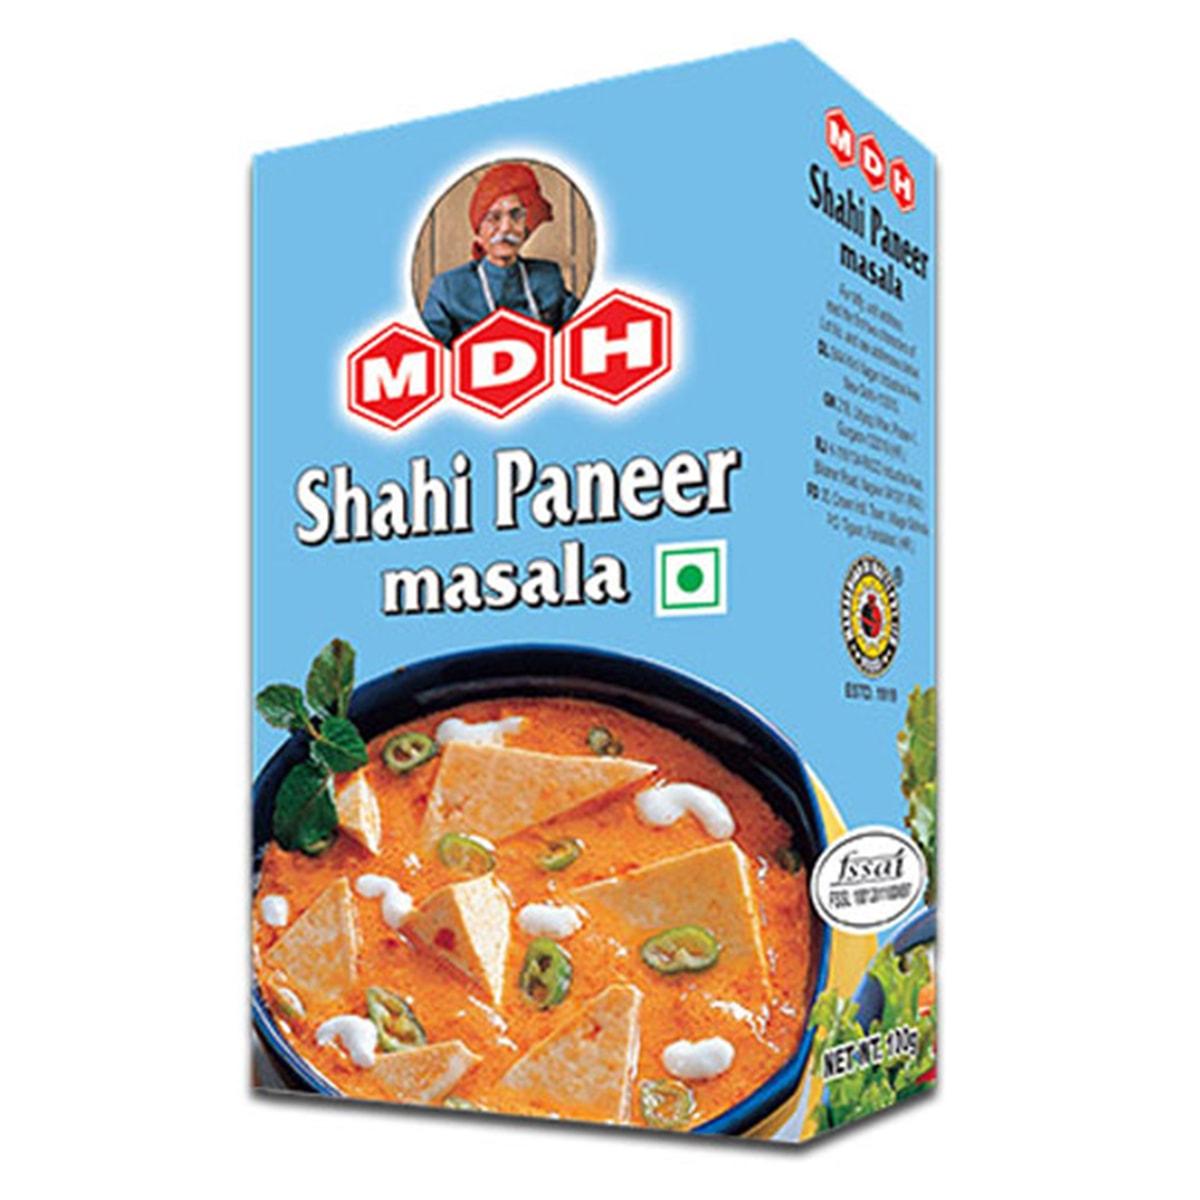 Buy MDH Shahi Paneer Masala - 100 gm